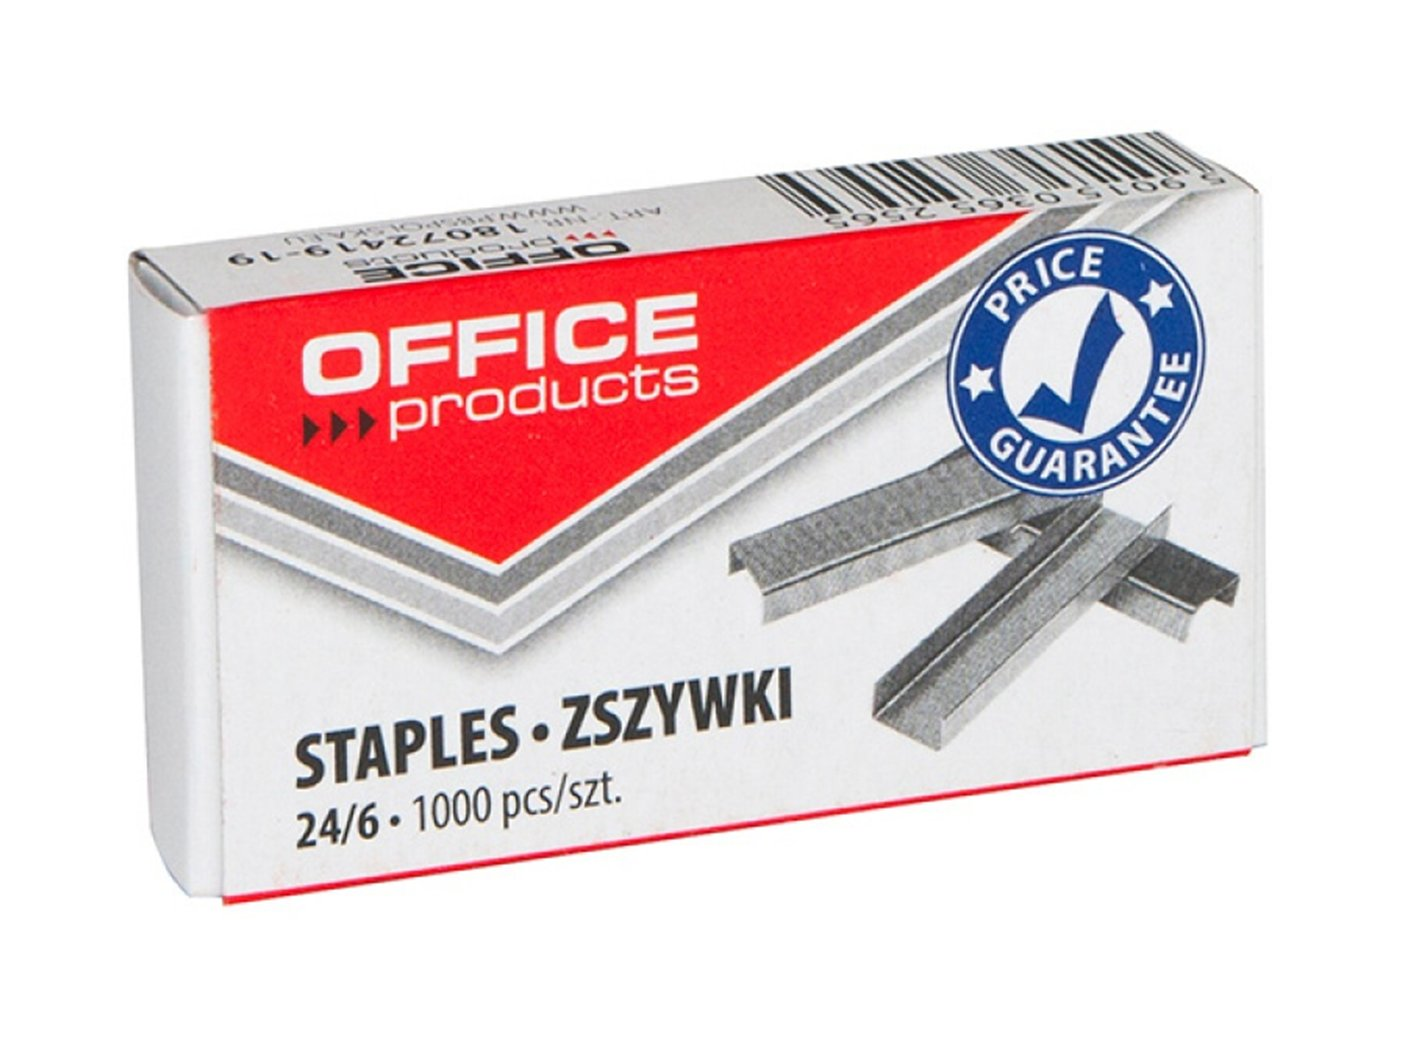 Item 24/6 standard staples 1000 PCs powerful OFFICE